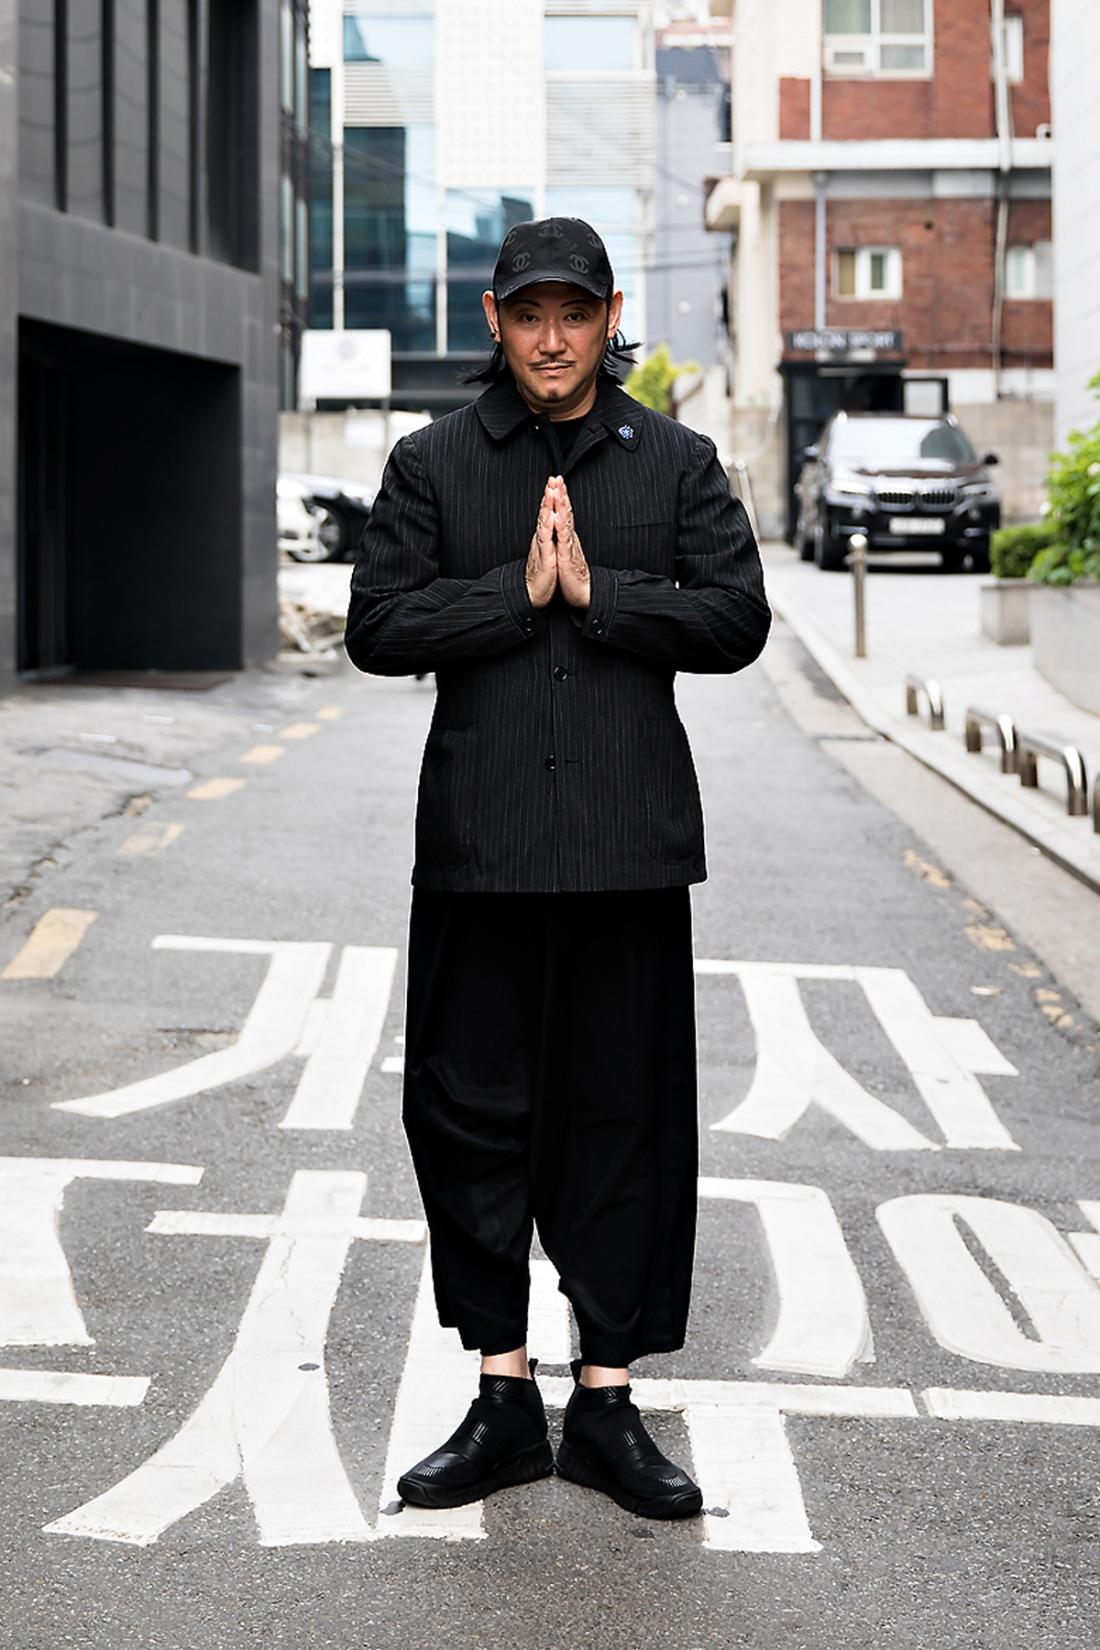 No Chungryang, Street Fashion 2017 in Seoul